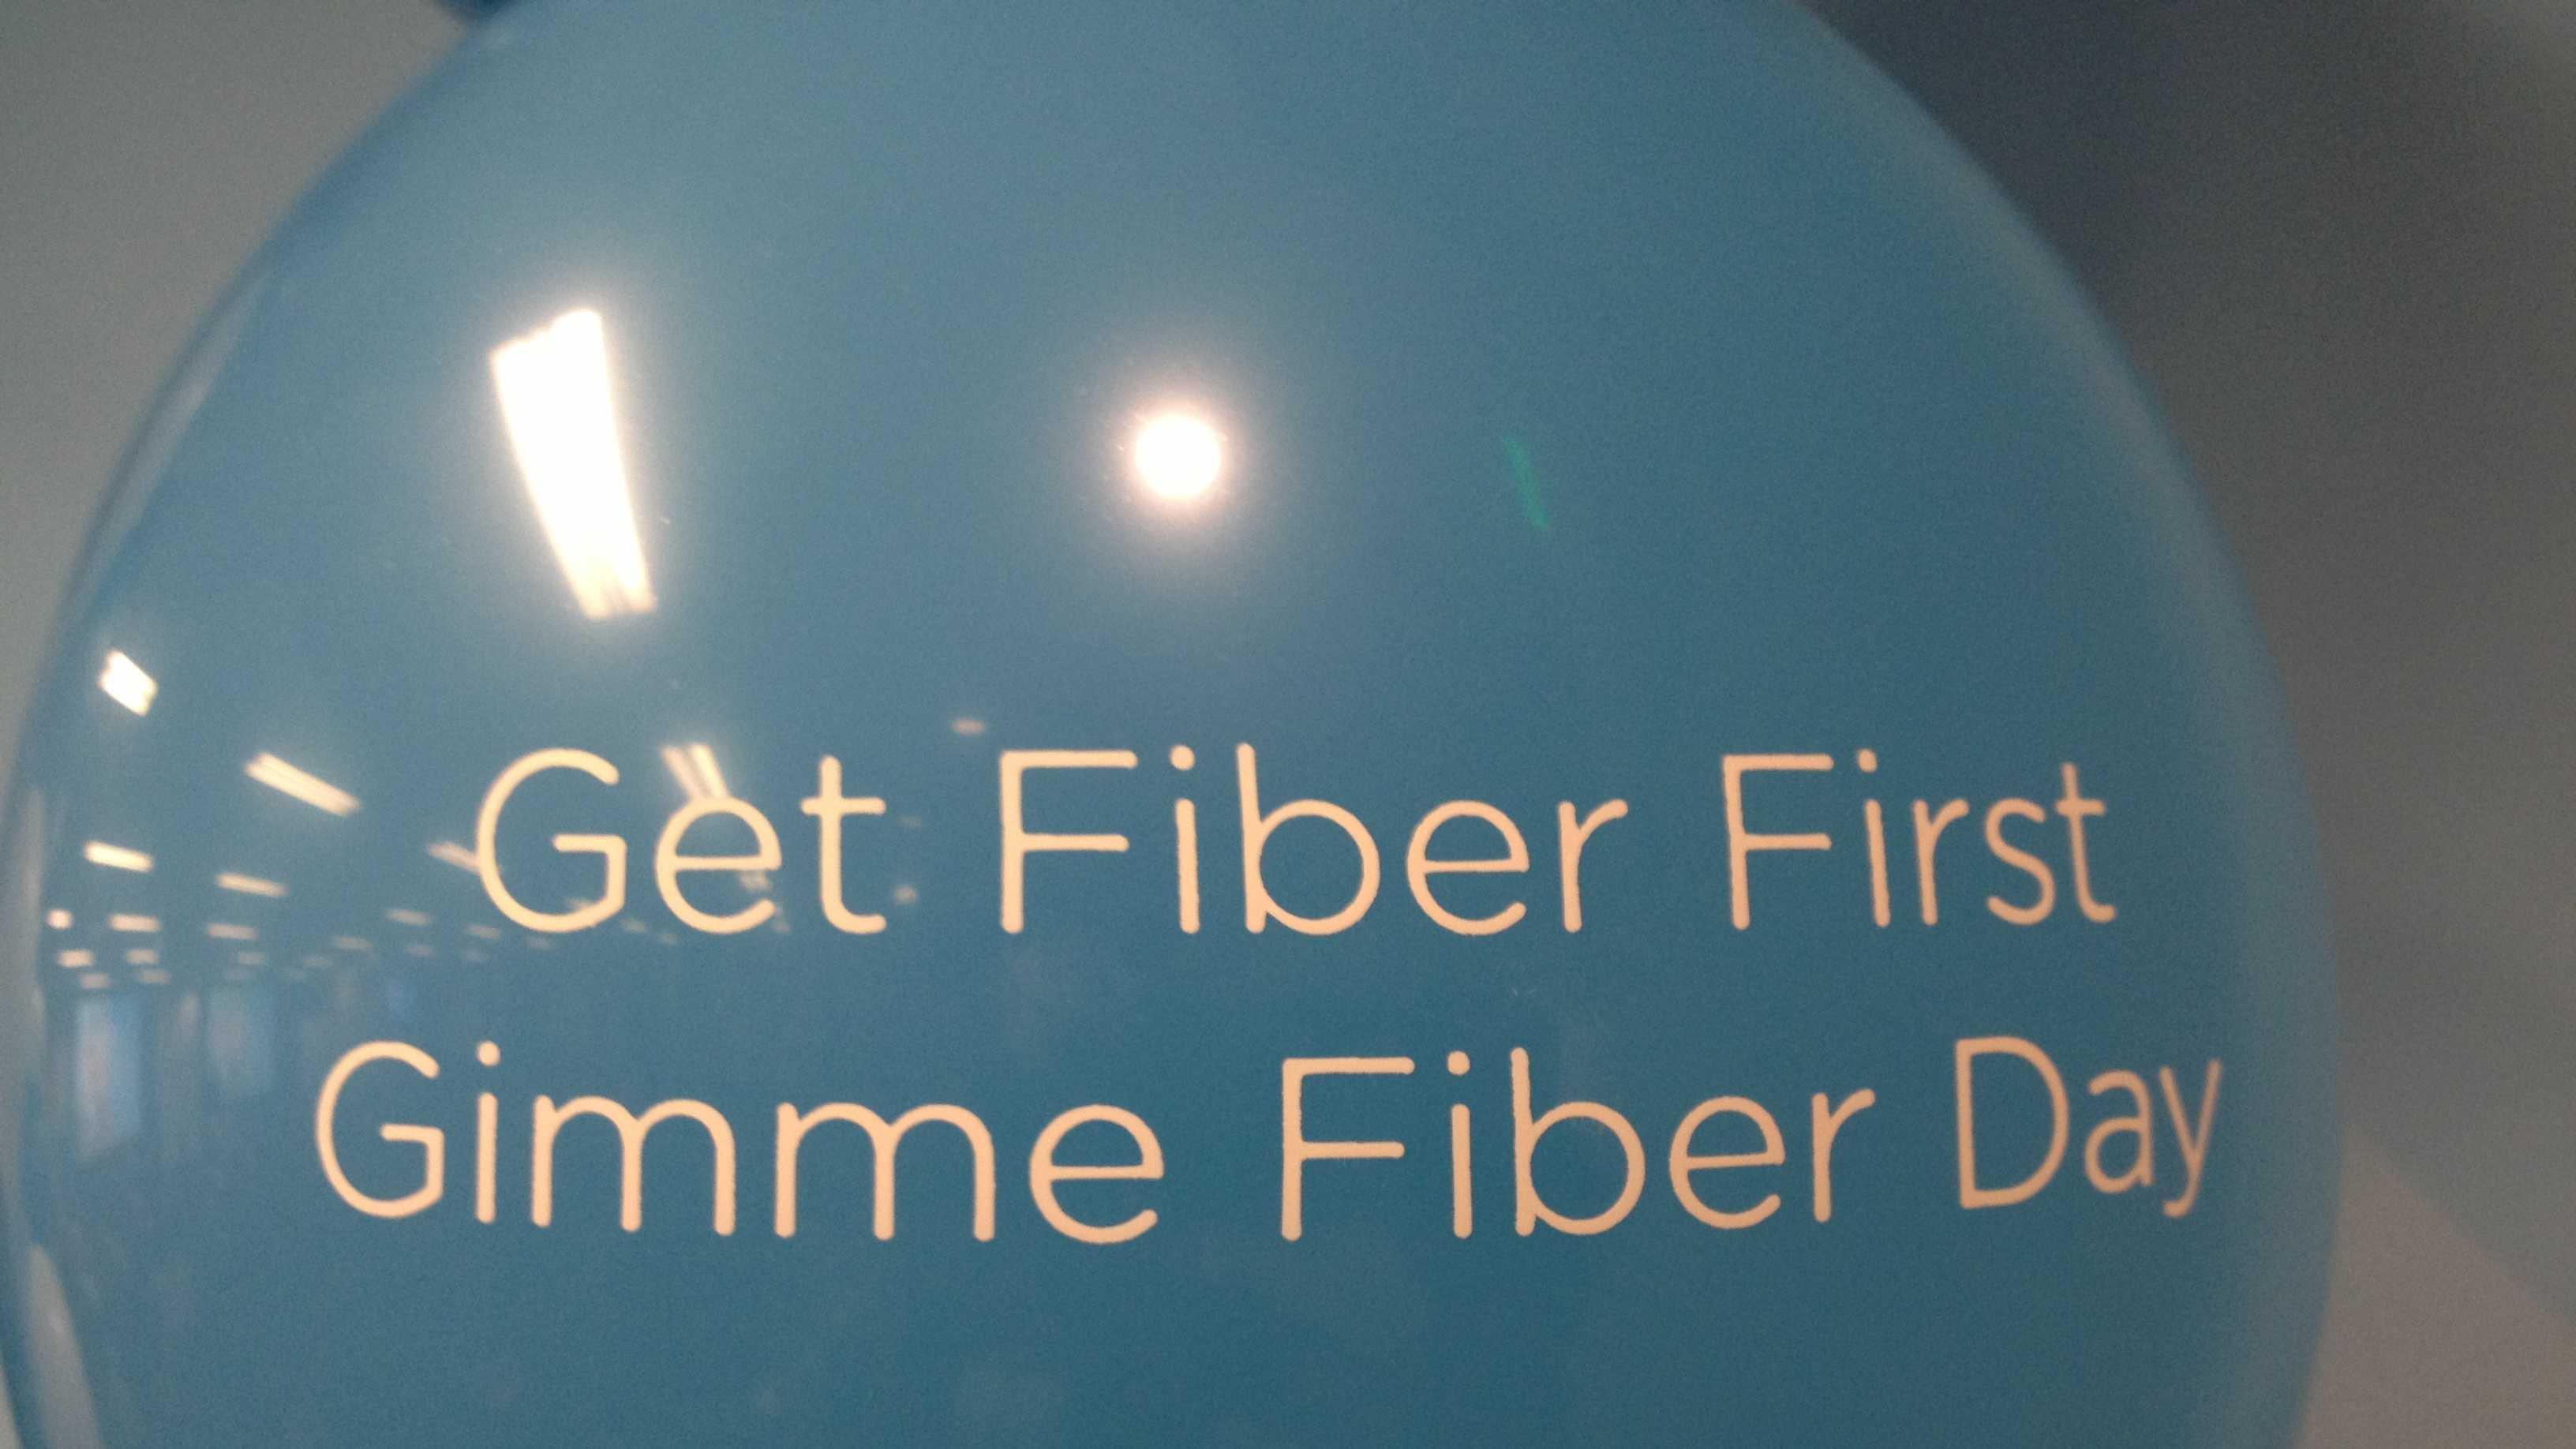 Gimme fiber